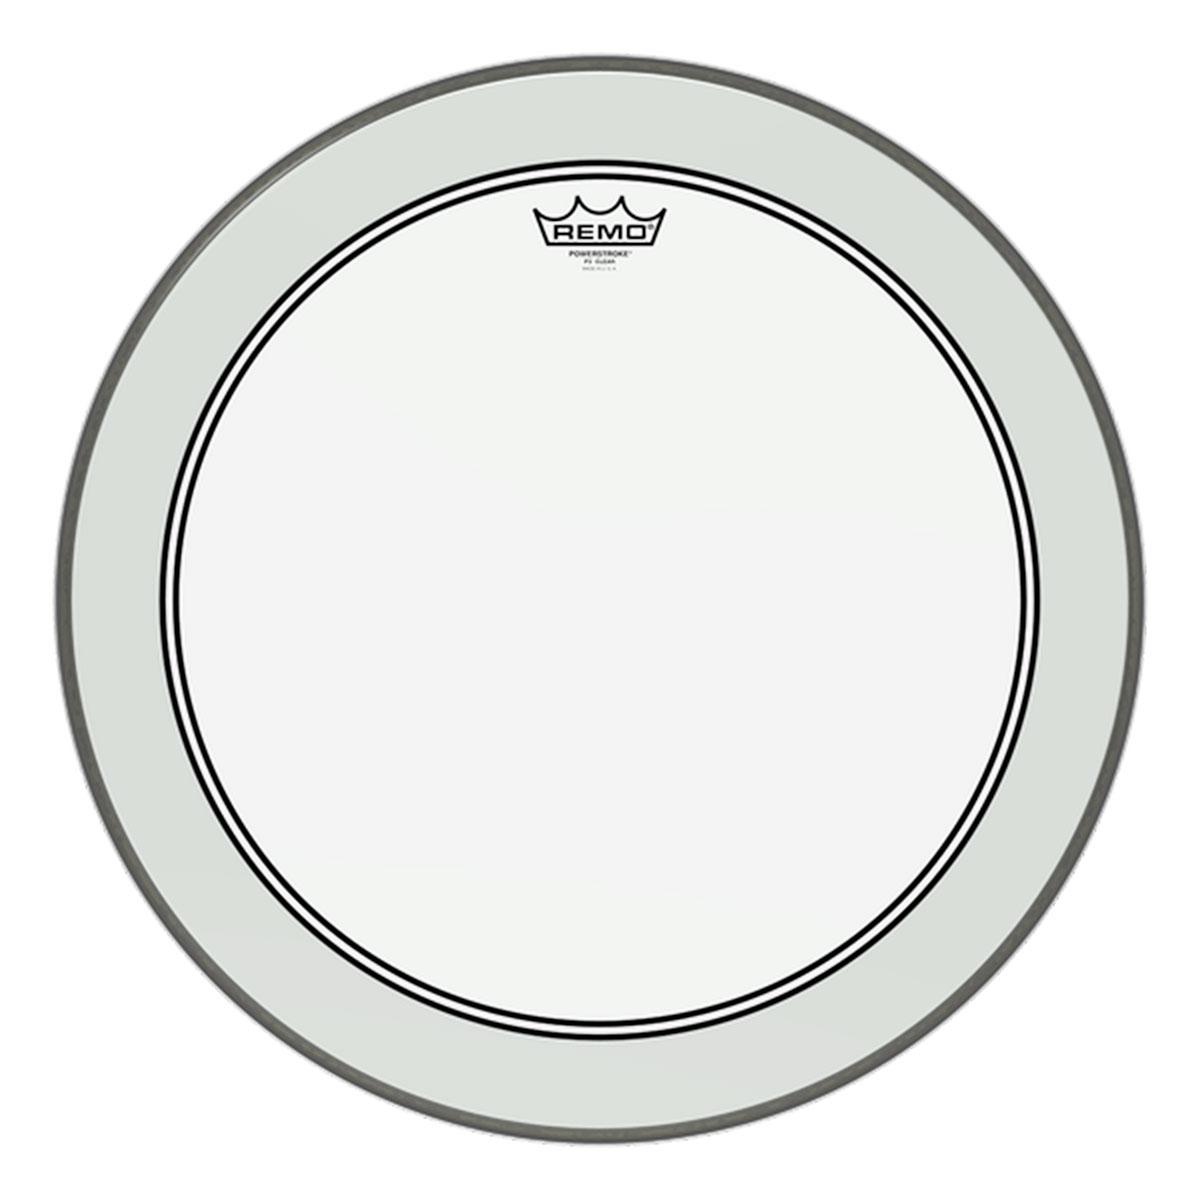 Remo - Peau Grosse caisse 20 - Powerstroke P3 transparent